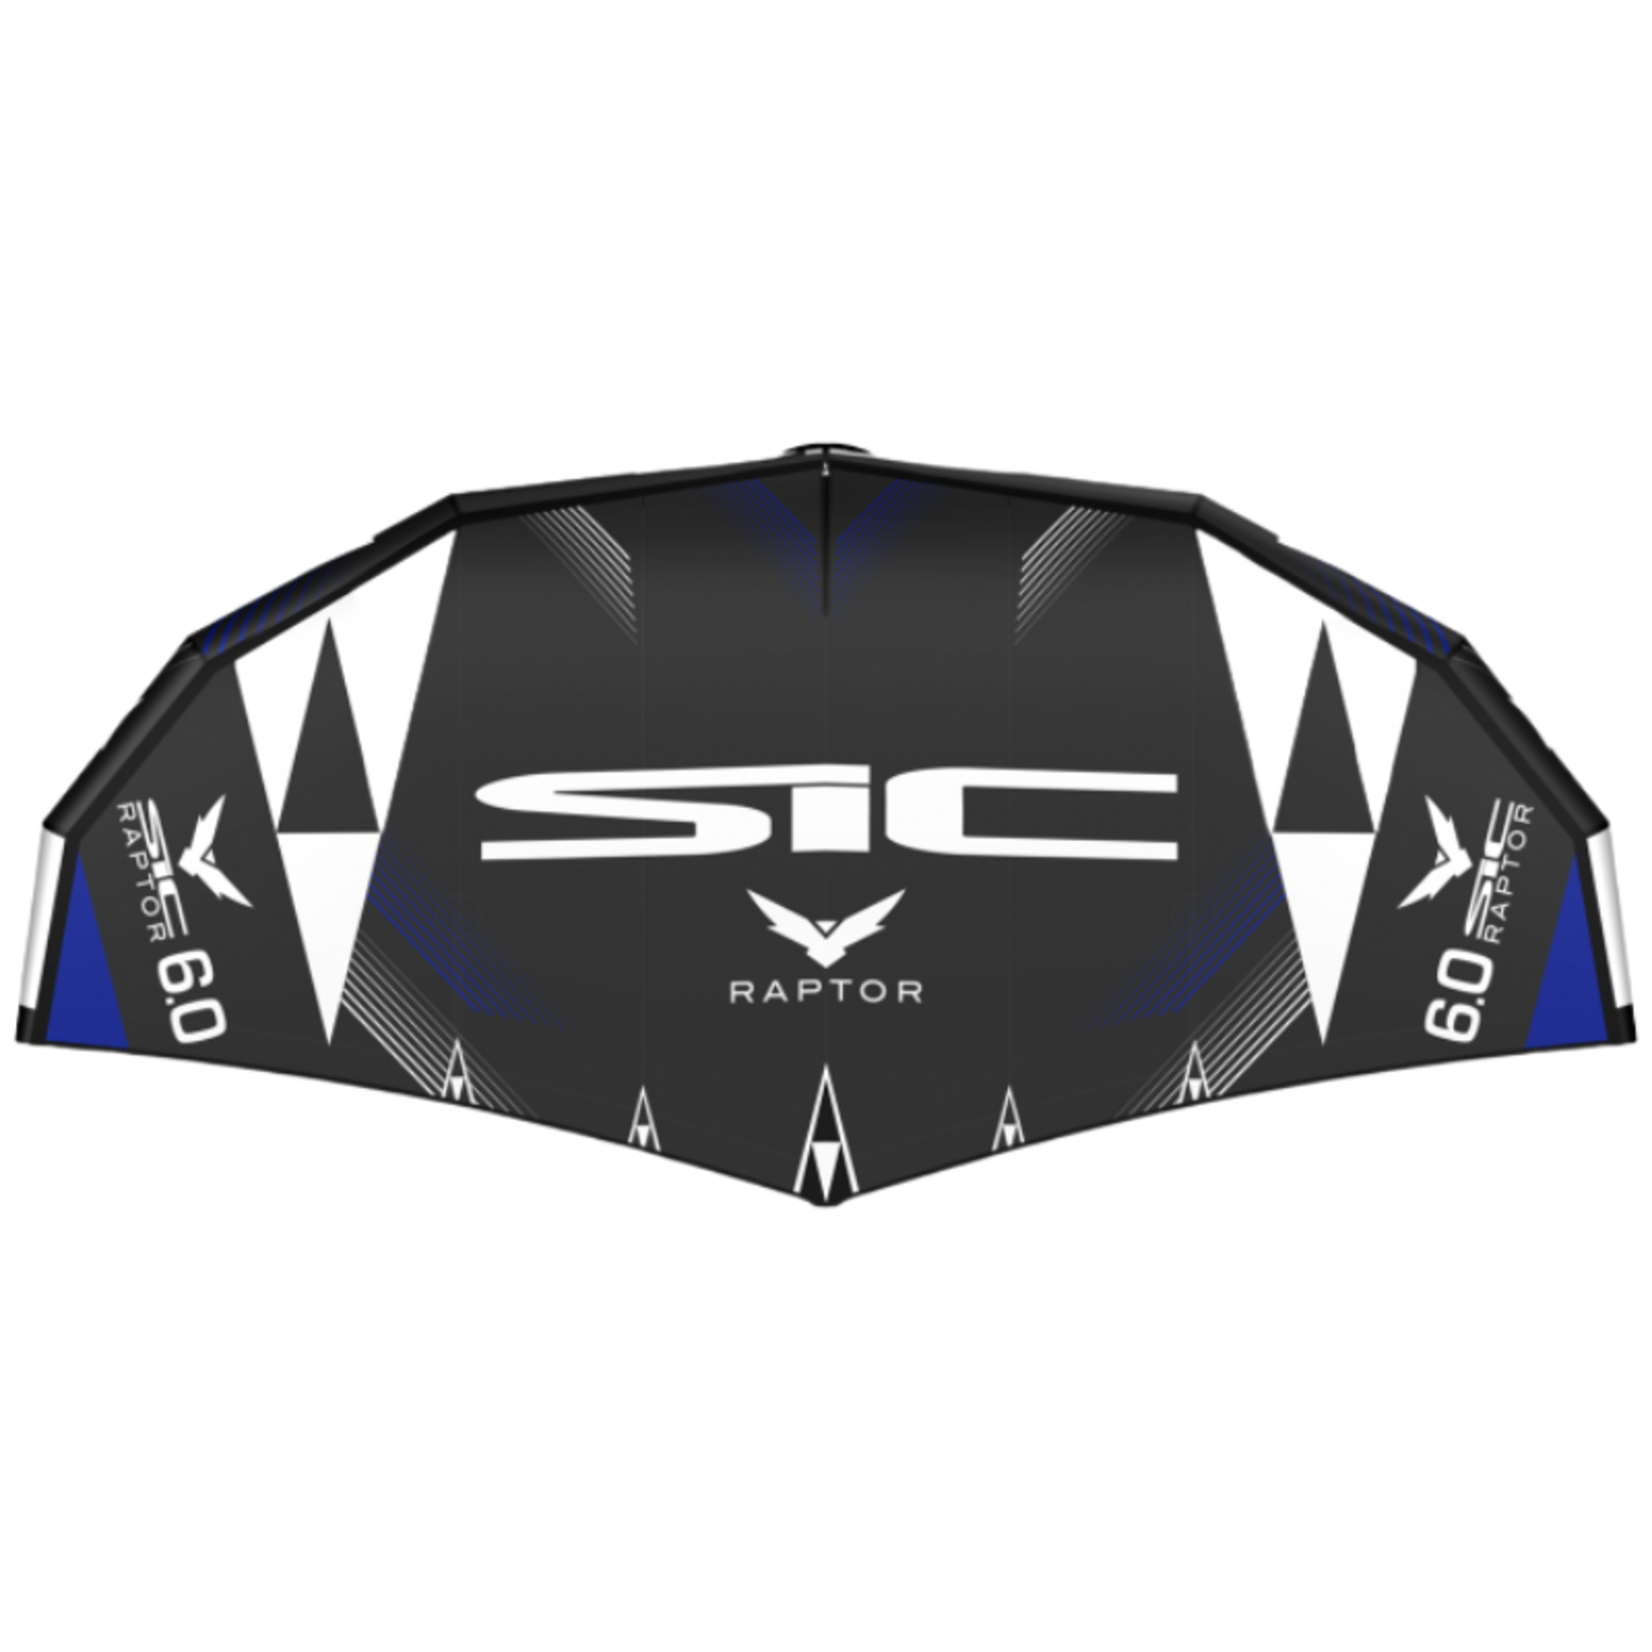 SIC Maui SUP SIC Raptor Foil Wind Wing 6'0